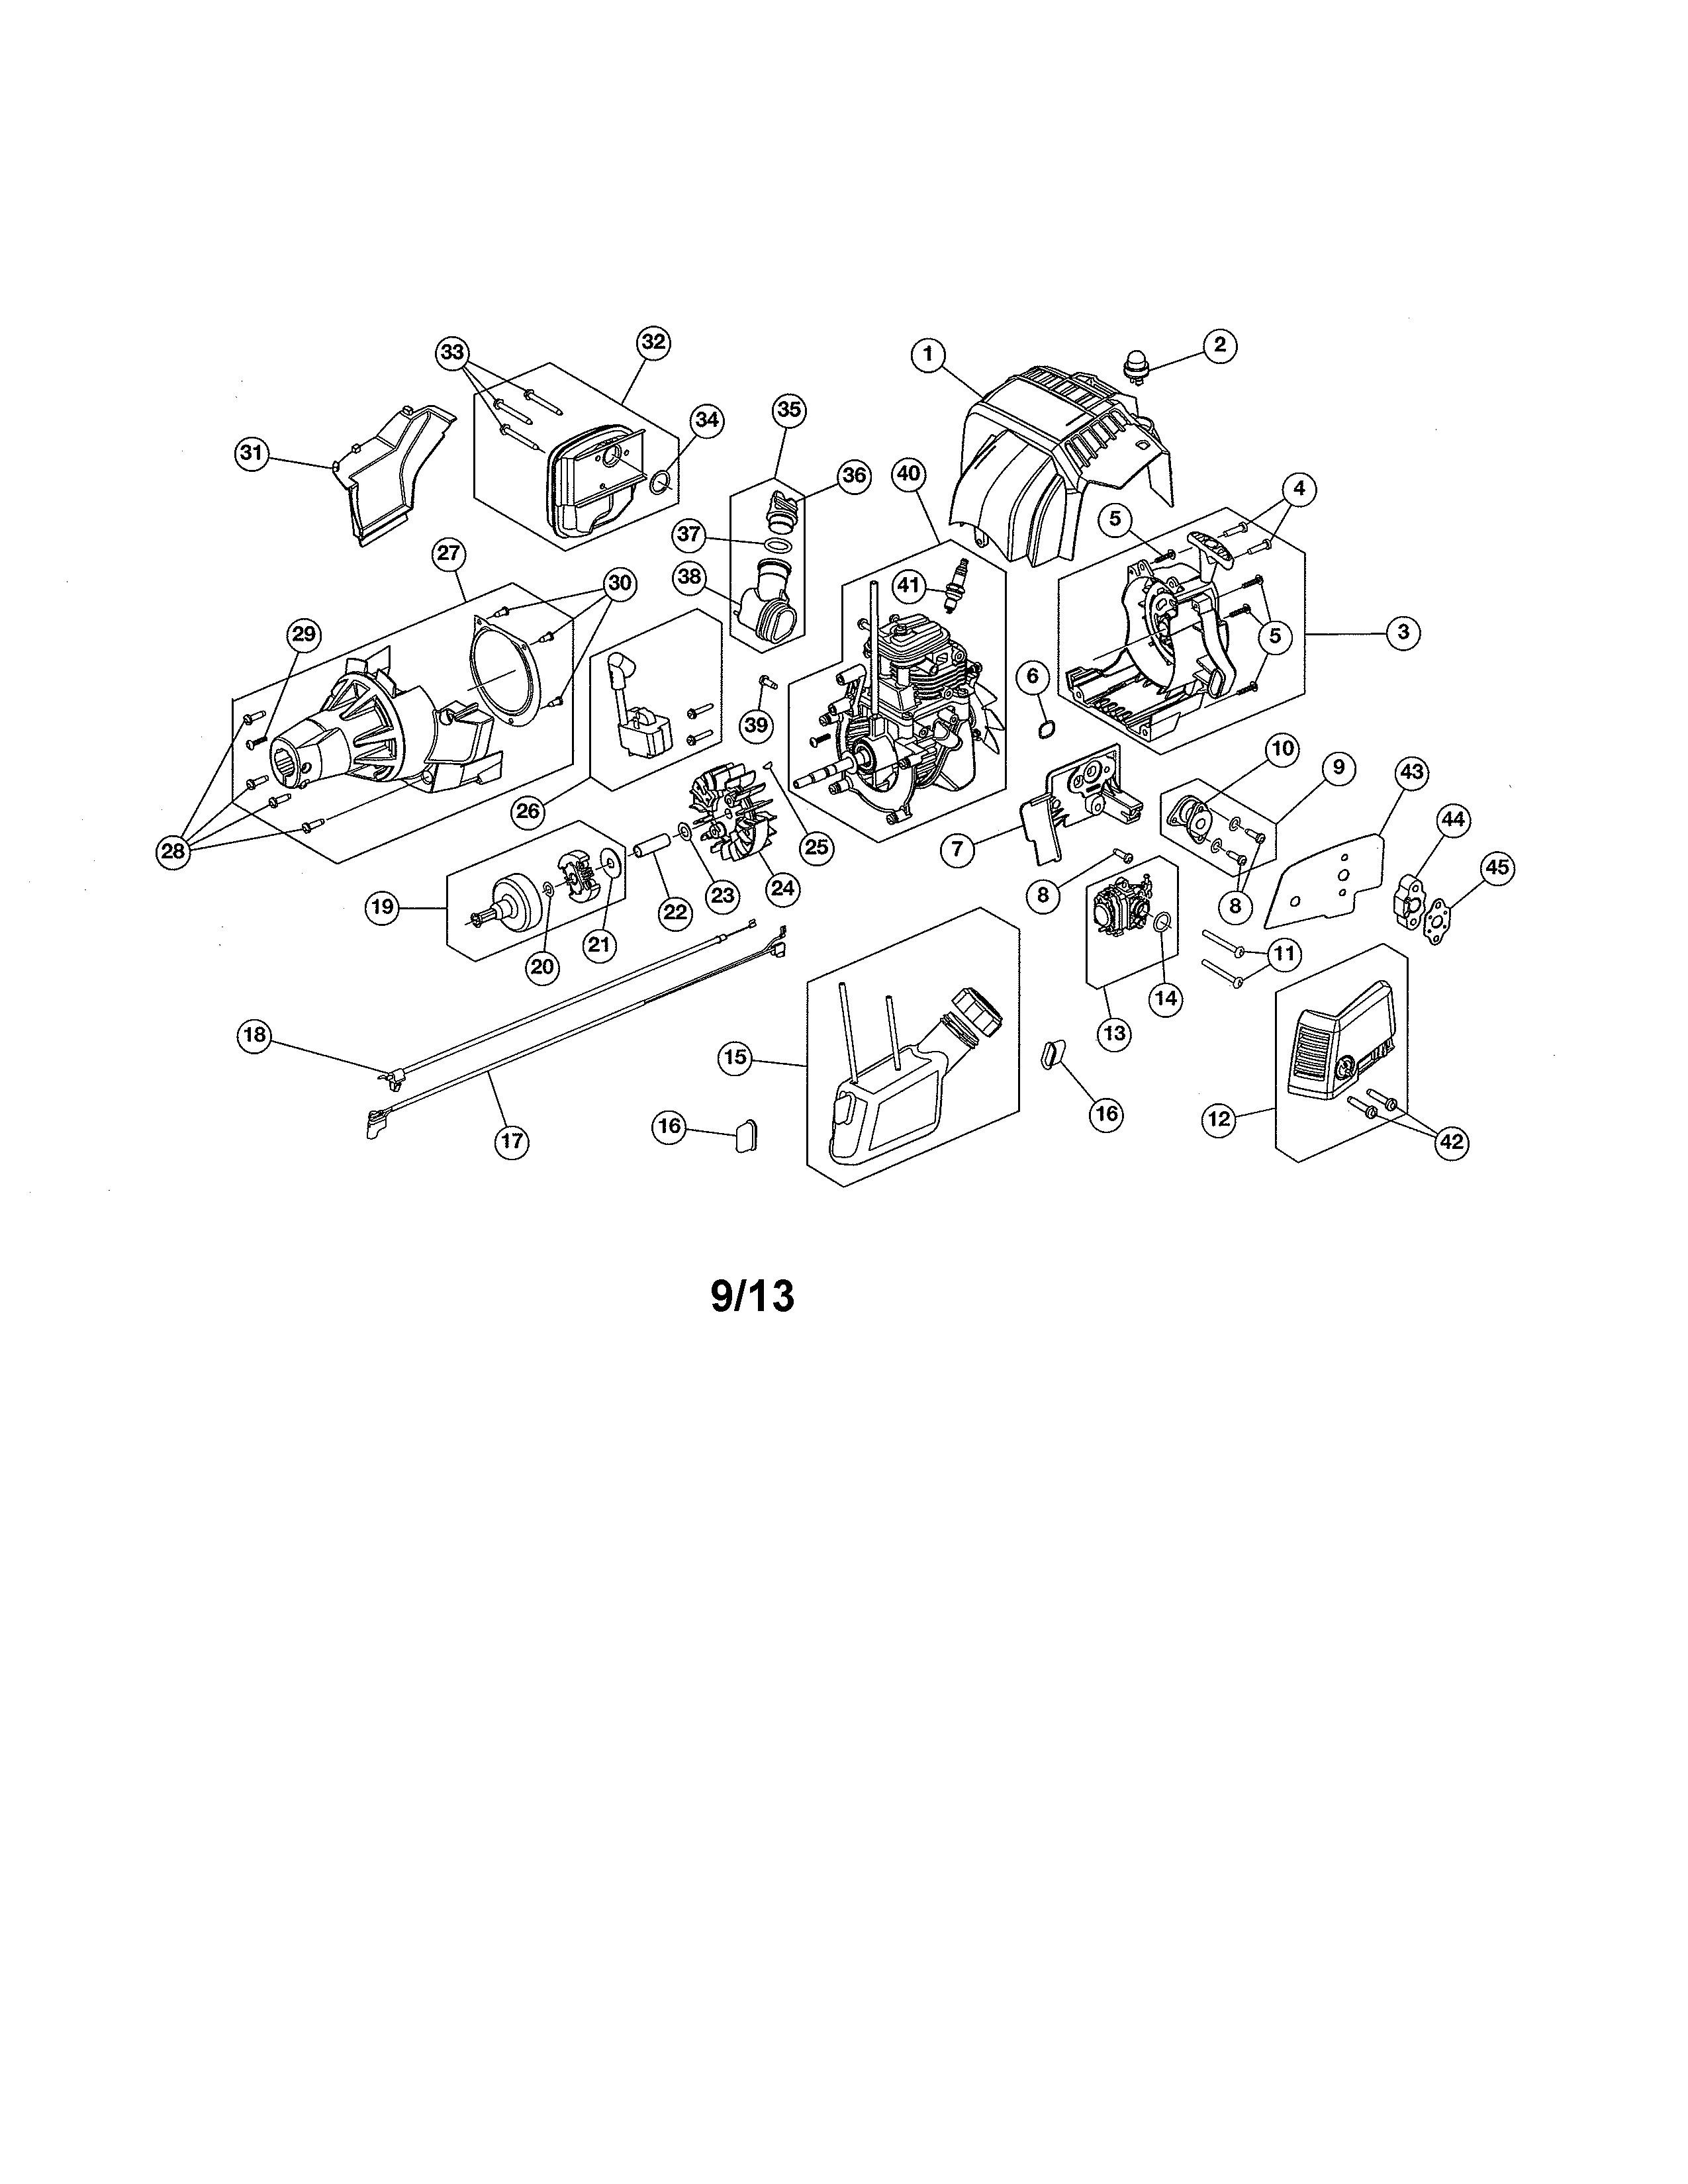 Four Stroke Engine Diagram My Wiring 4 Craftsman 30cc Cycle Straight Shaft Weedwackergas Trimmer P 25503300